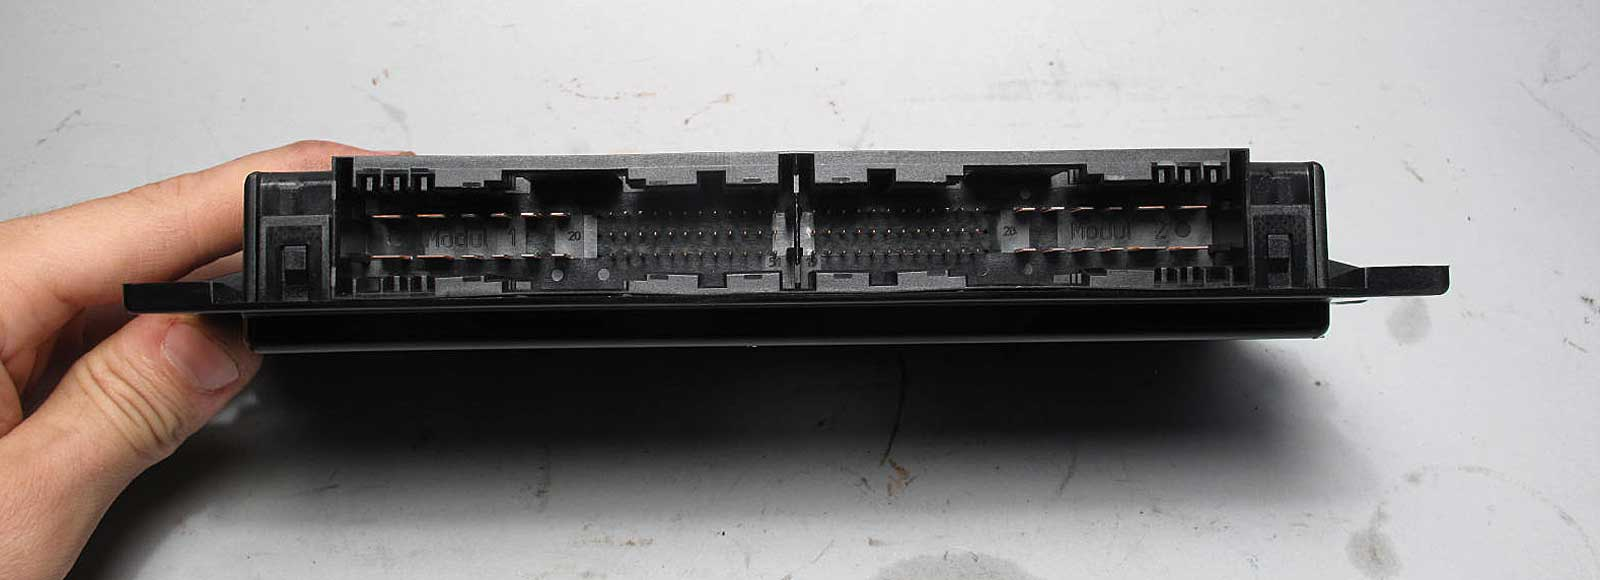 Bmw E90 E91 3 Series Frm Lkm Light Footwell Module Control Unit 2006 Location 2007 Oem